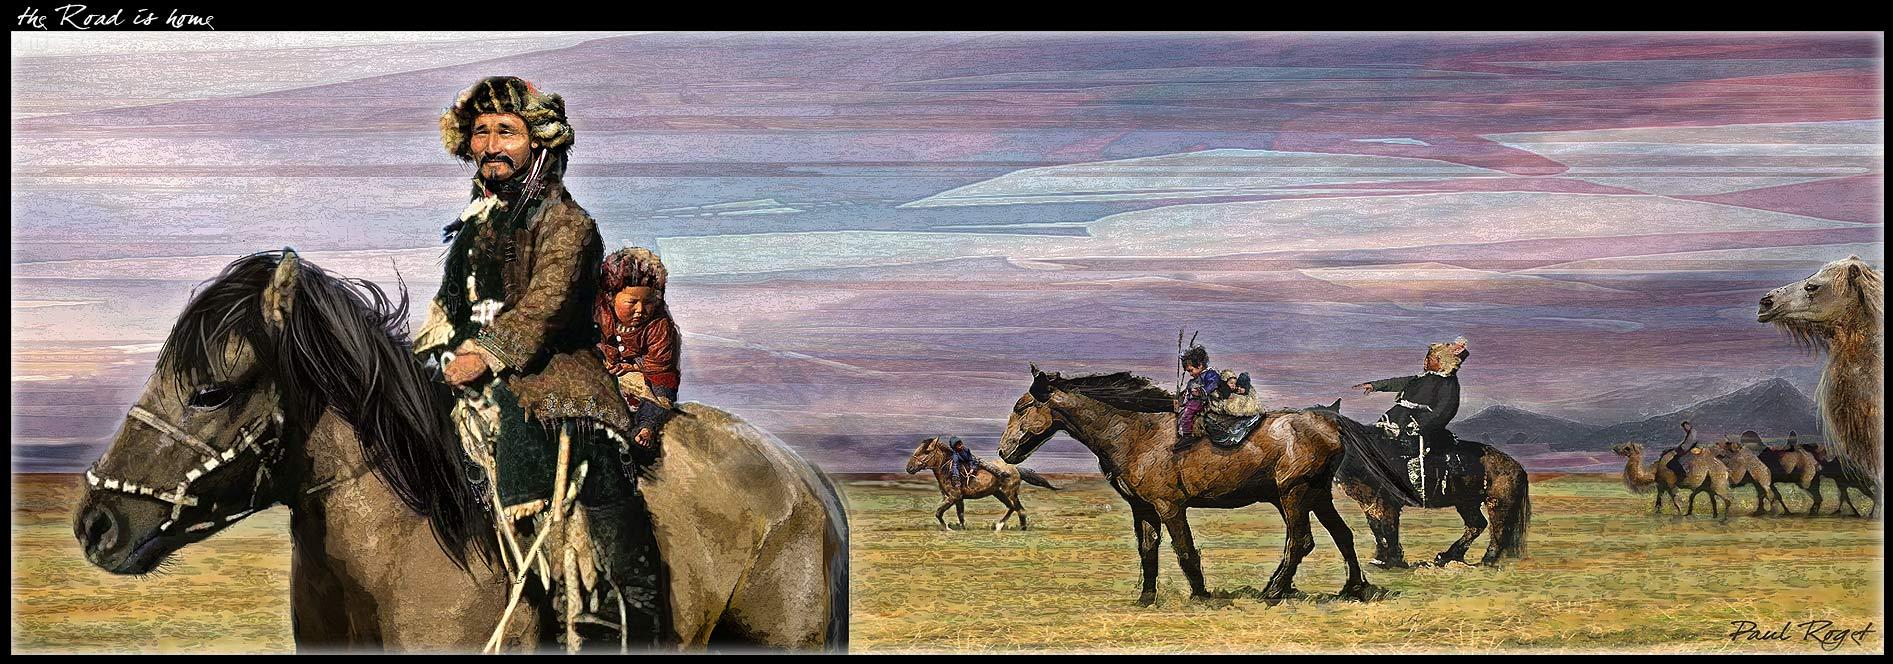 paul-roget-Mongolian-Journey.jpg